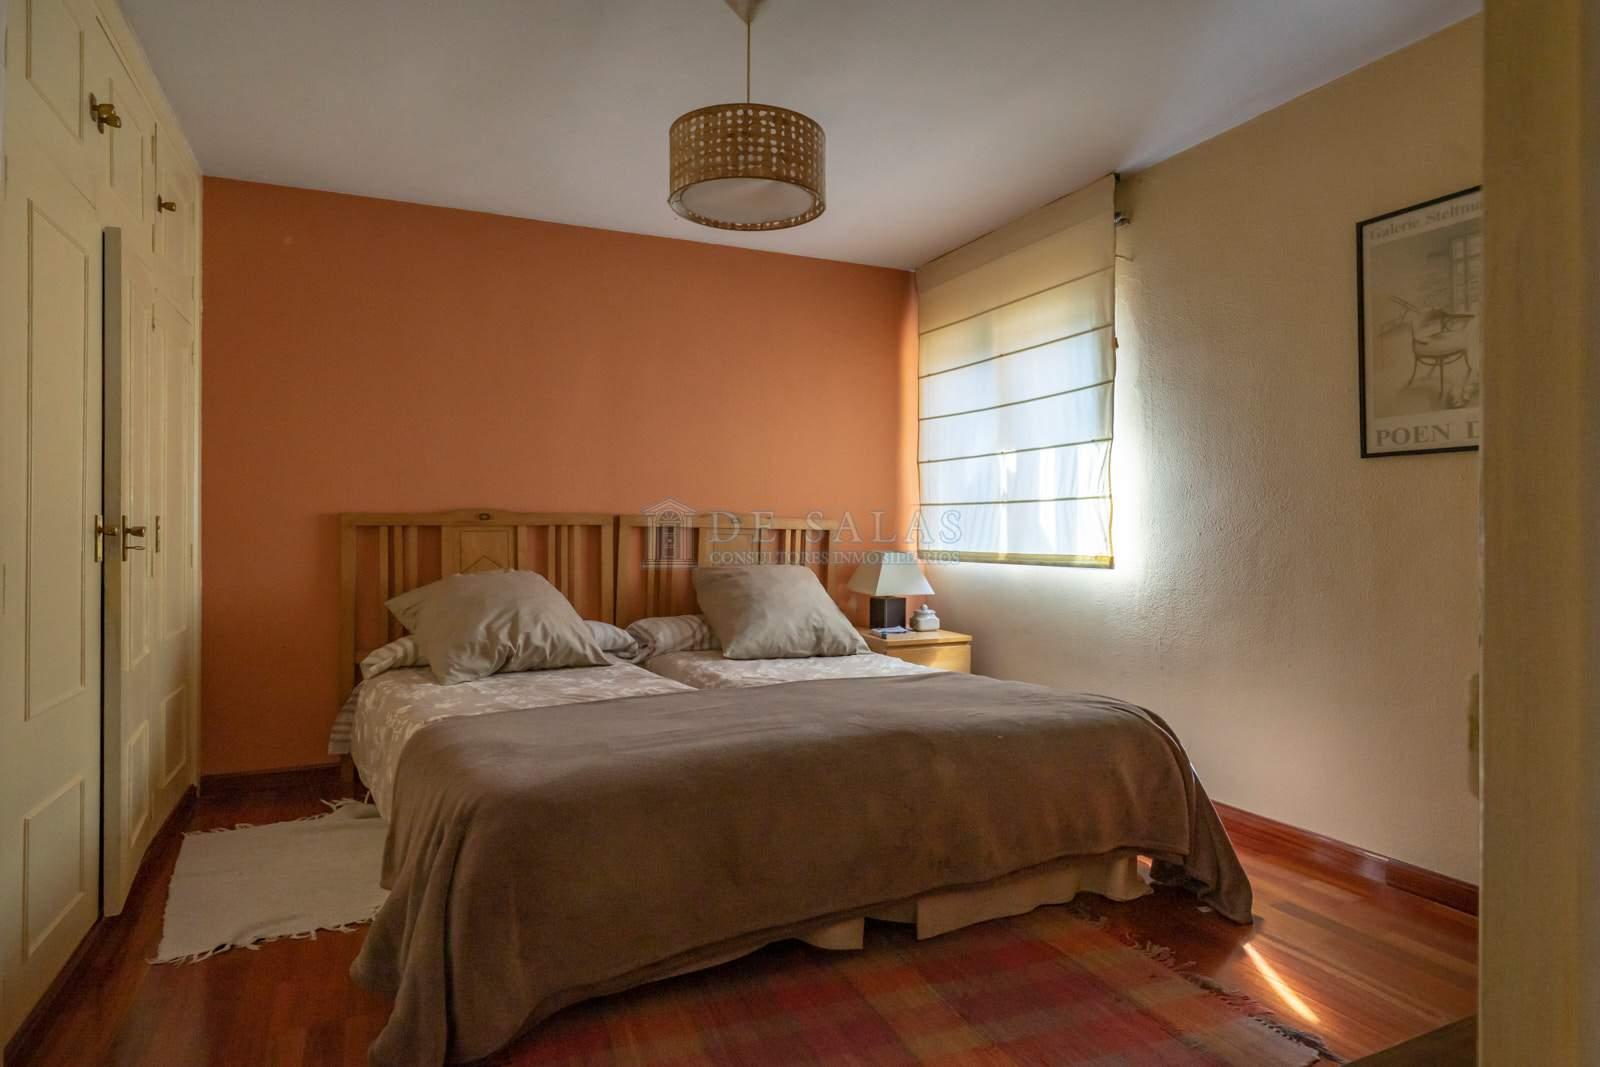 03-Dormitorio Piso Soto de la Moraleja